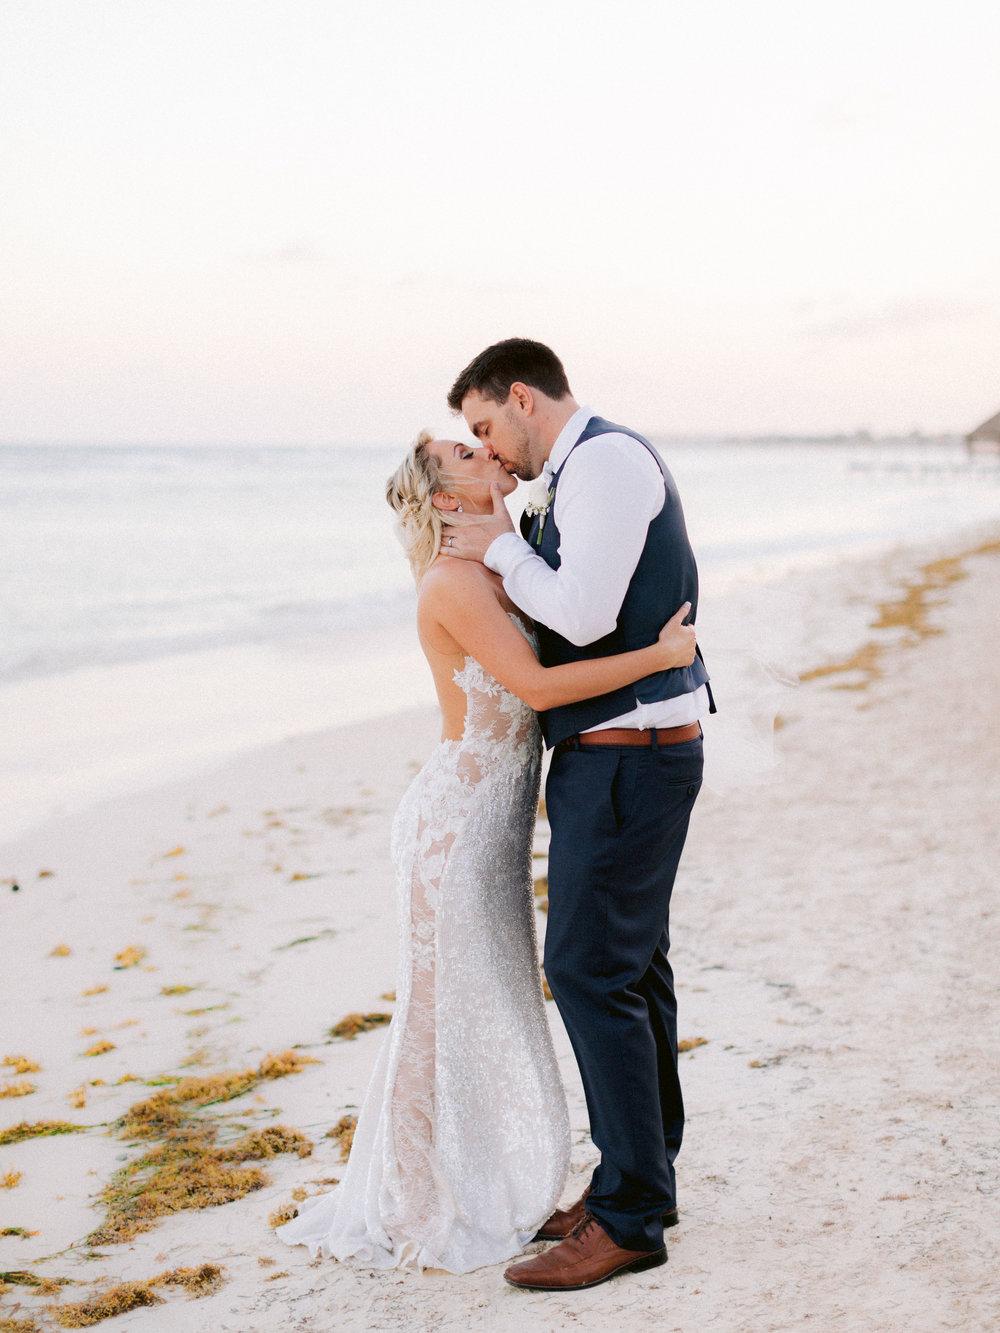 Kim_Jeff_Cancun Wedding_Portraits_Kurtz_Orpia (167 of 178).jpg